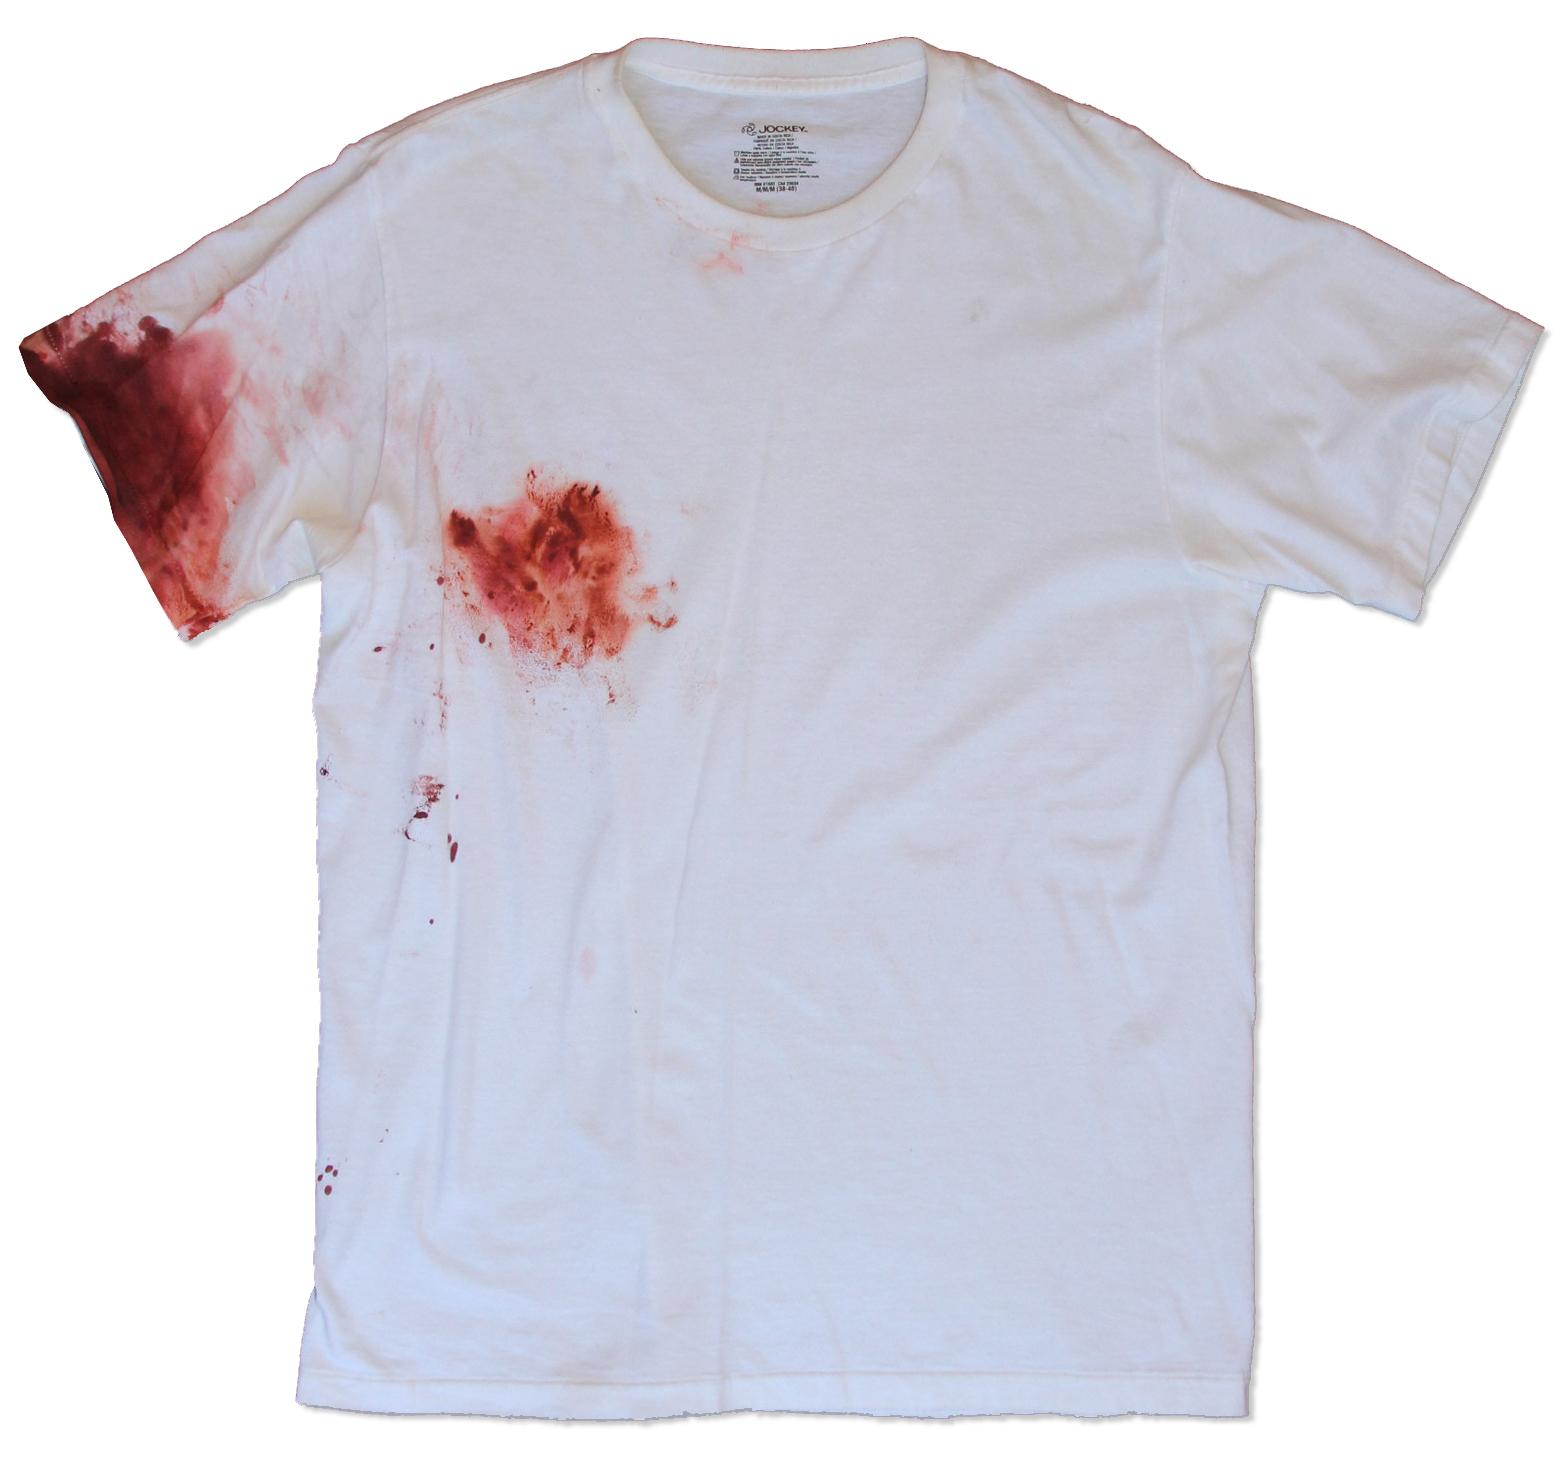 Lot Detail Bruce Willis Screen Worn Wardrobe From 39 39 Red